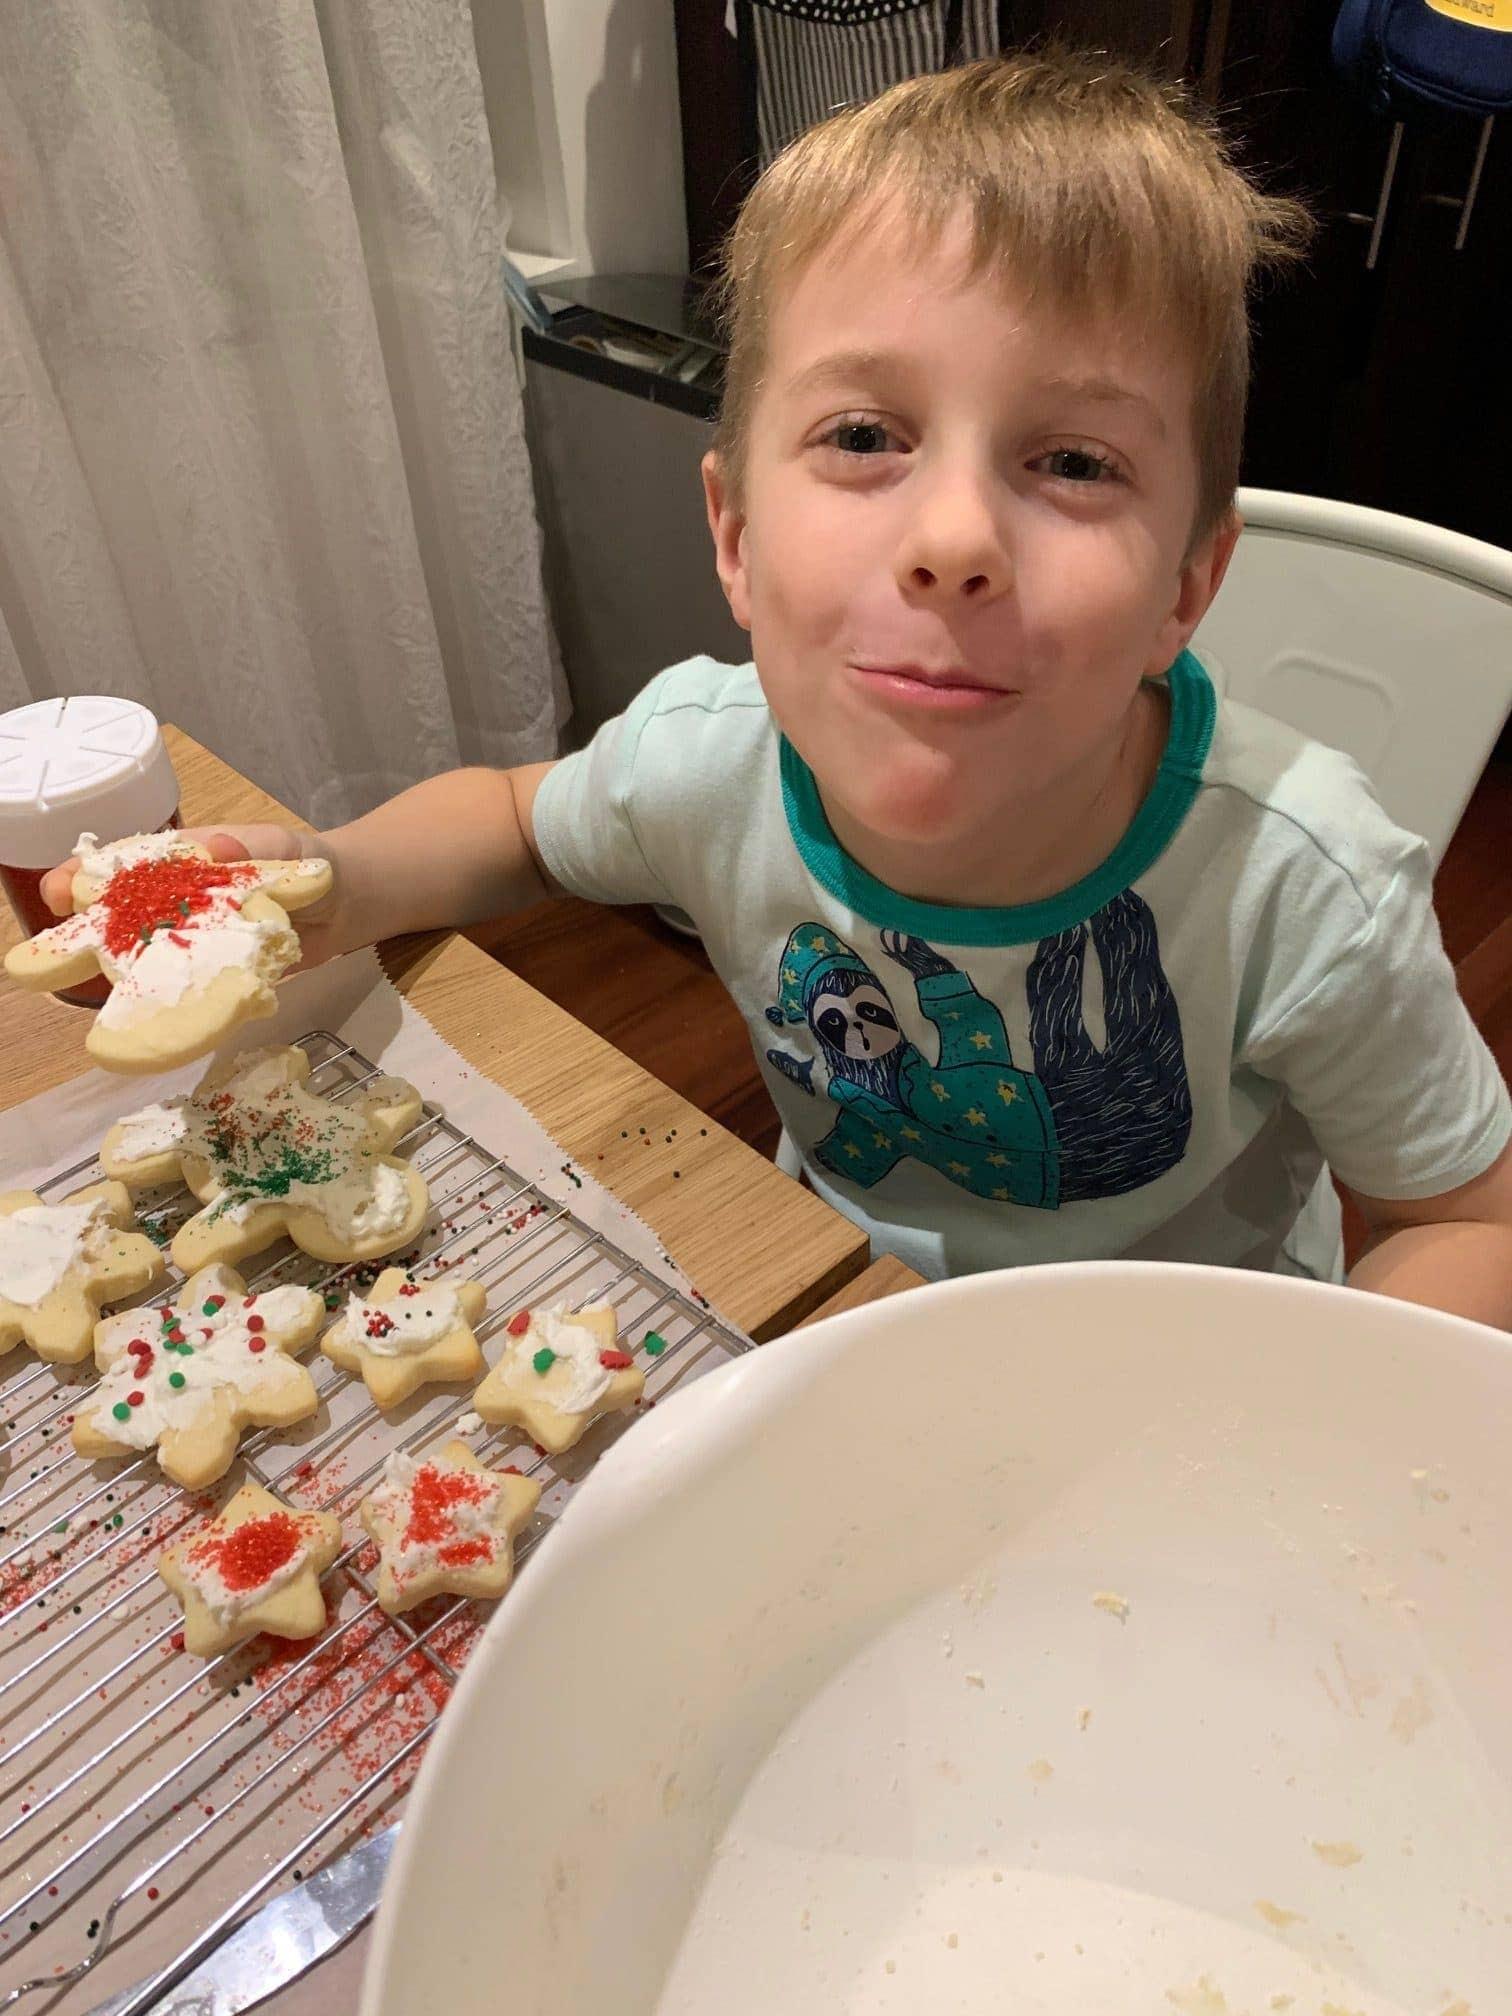 Blake eating a decorated sugar cookie